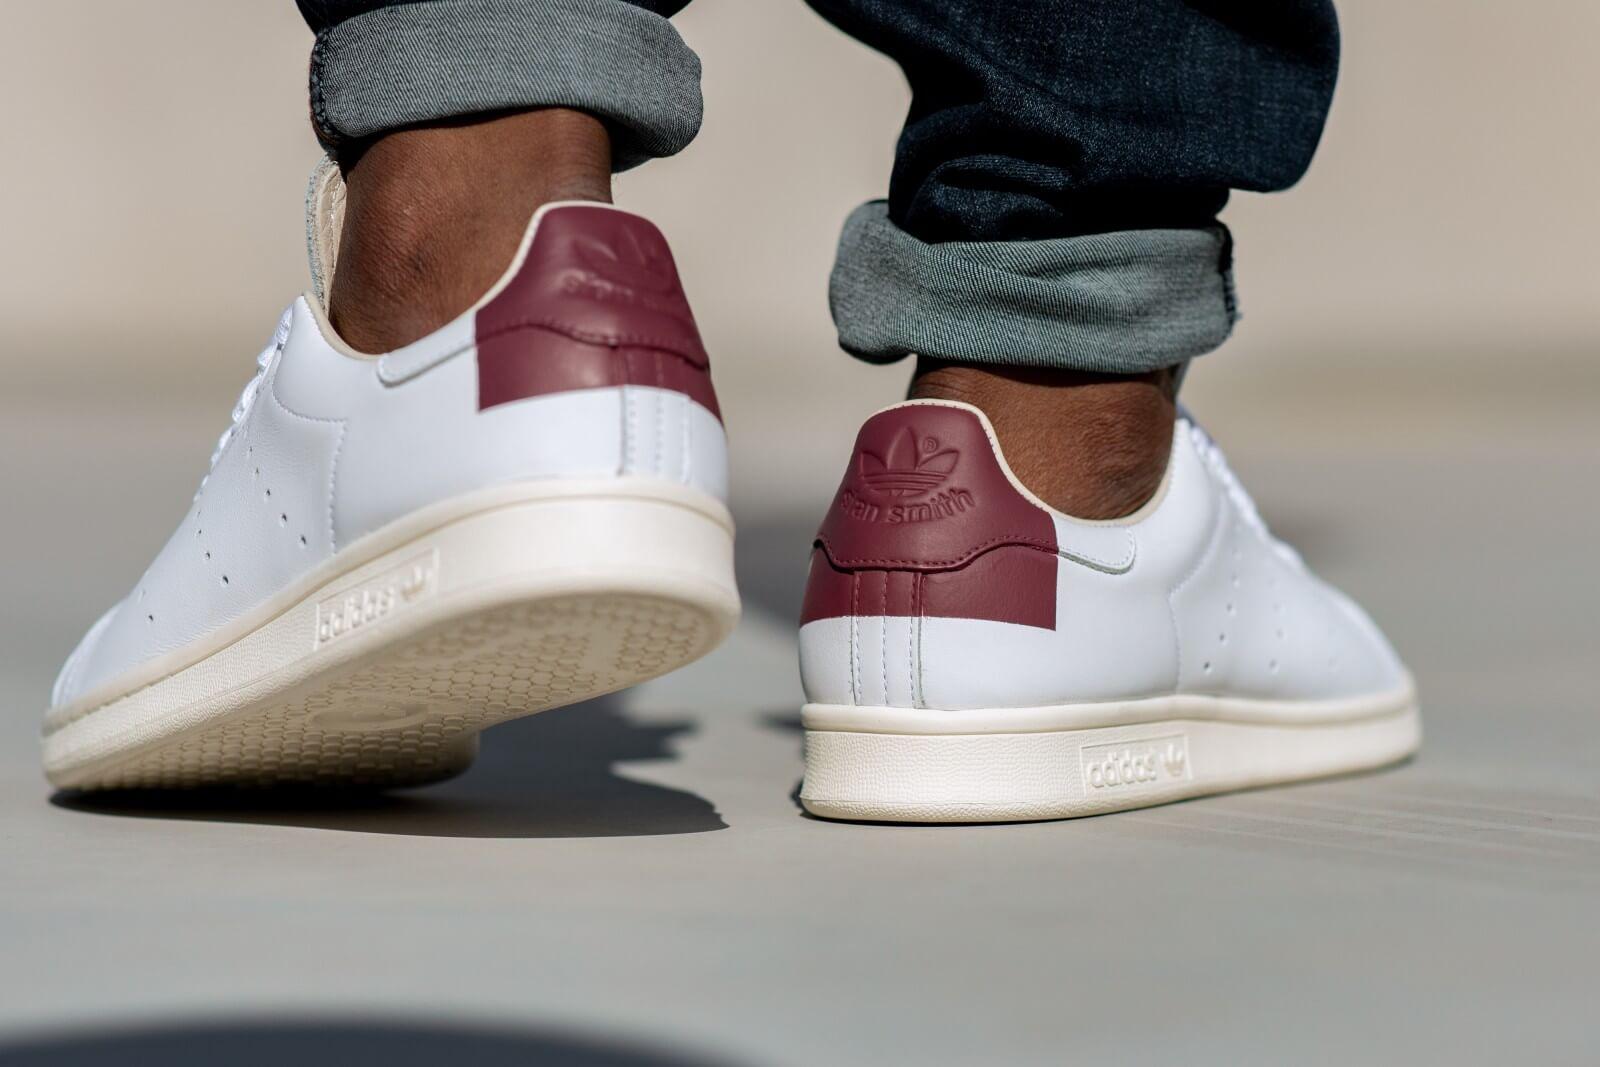 Adidas Stan Smith Footwear WhiteBurgundy EE5784